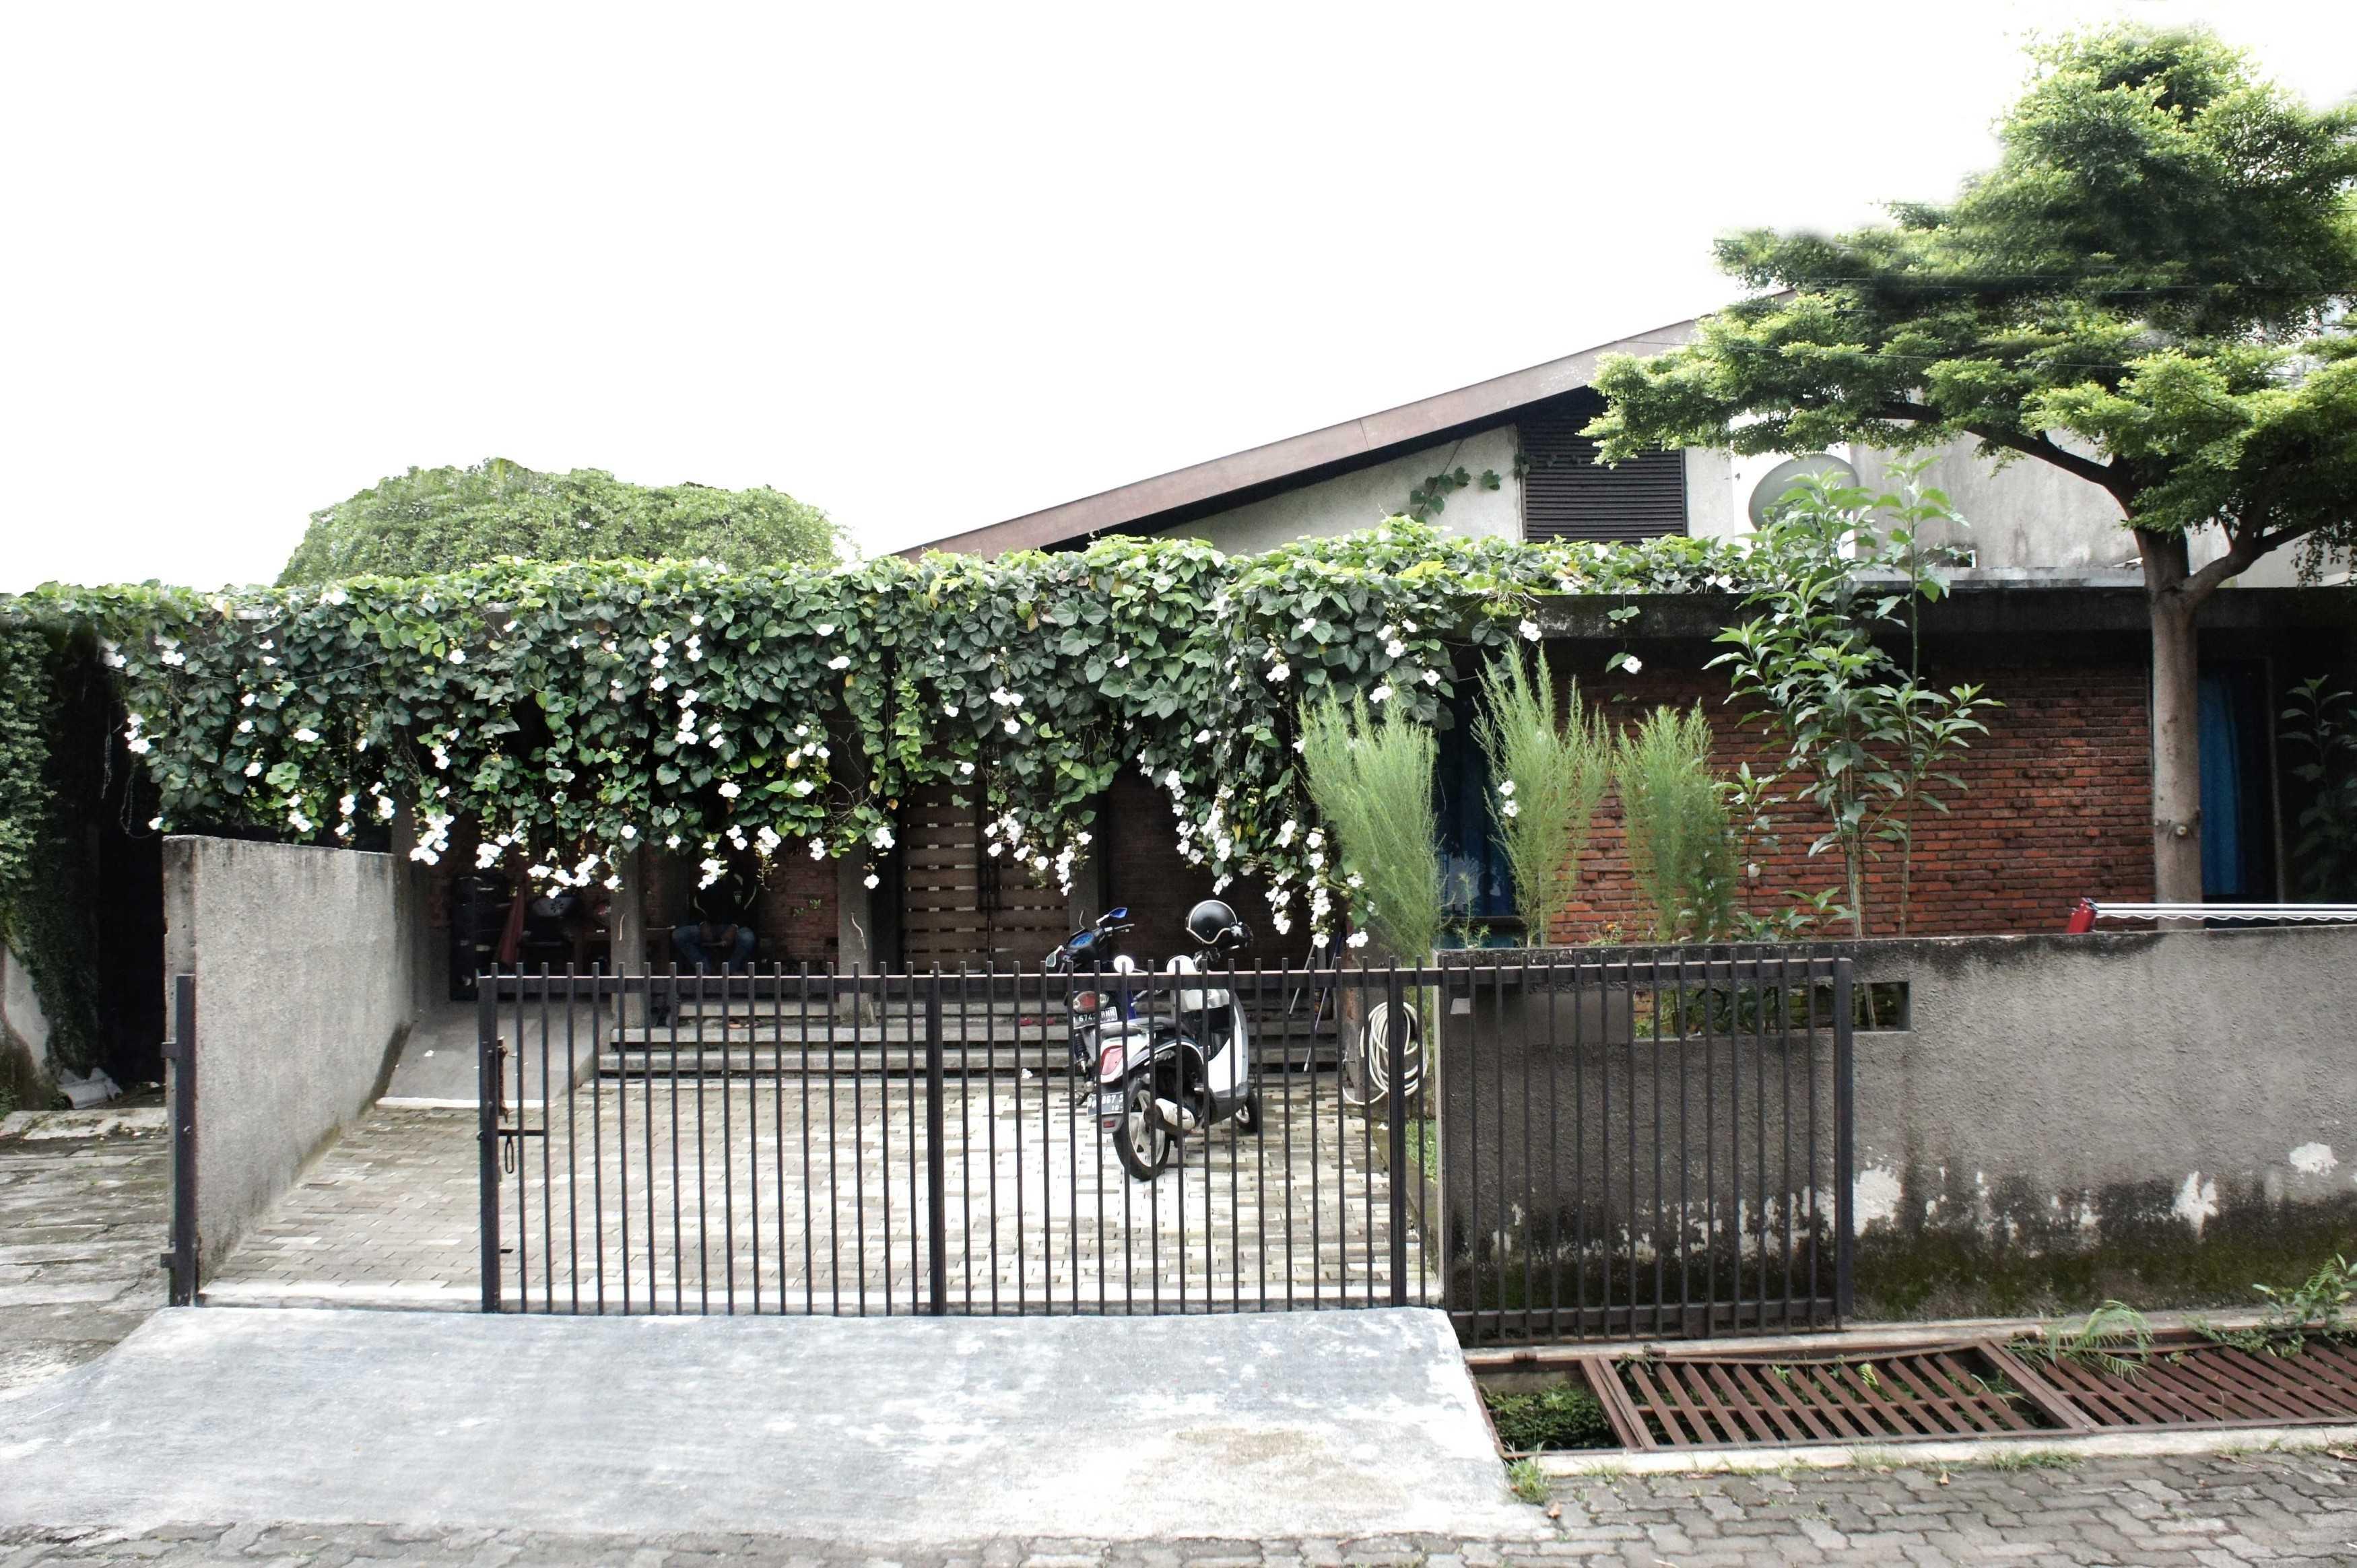 Labworks Architect Selasar House Rempoa, Ciputat Tim., Kota Tangerang Selatan, Banten, Indonesia Rempoa, Ciputat Tim., Kota Tangerang Selatan, Banten, Indonesia Exterior View Tropical  52087